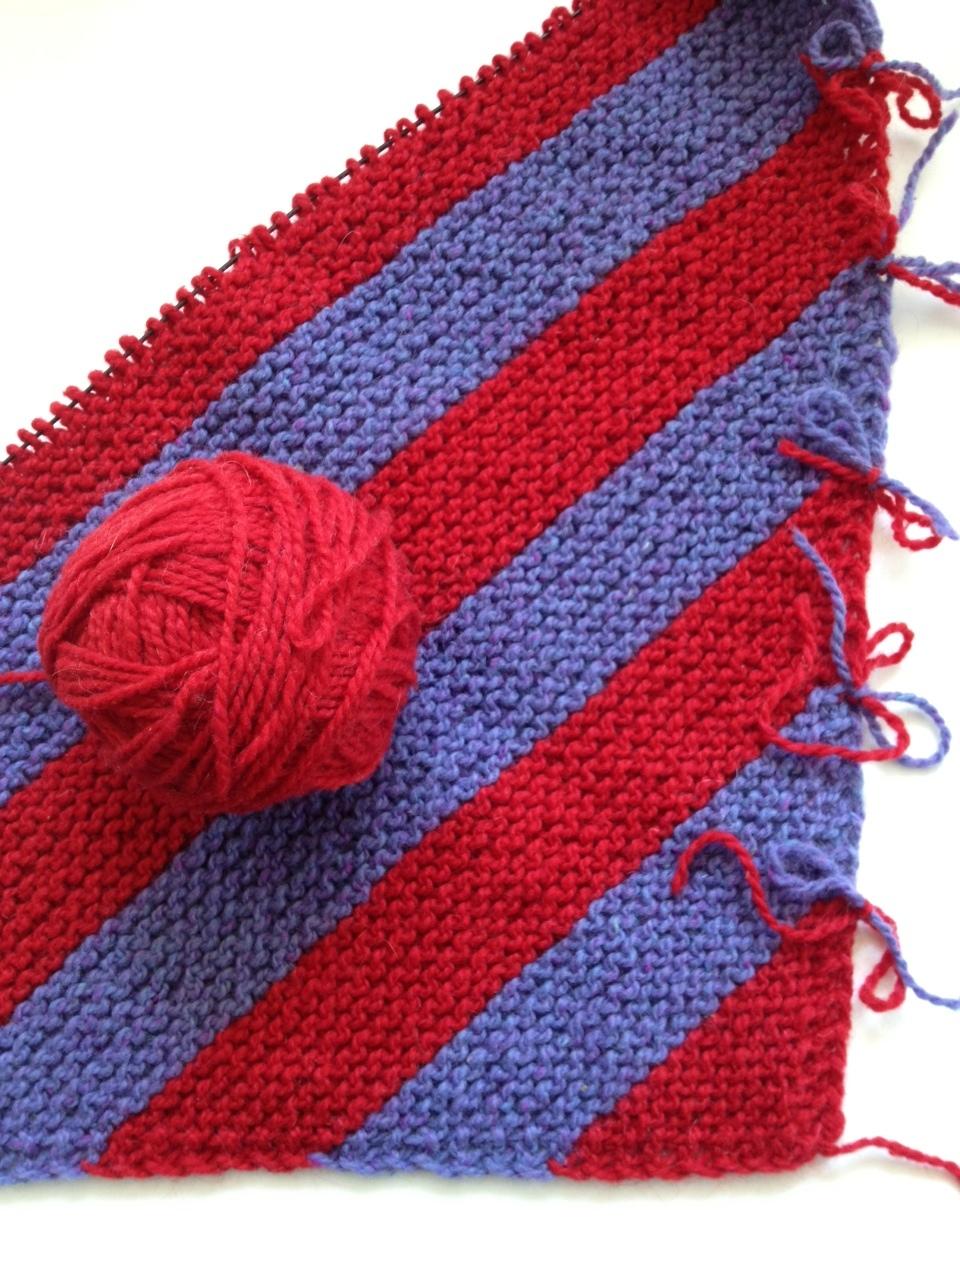 Here's my Diagonal knitting Work in Progress